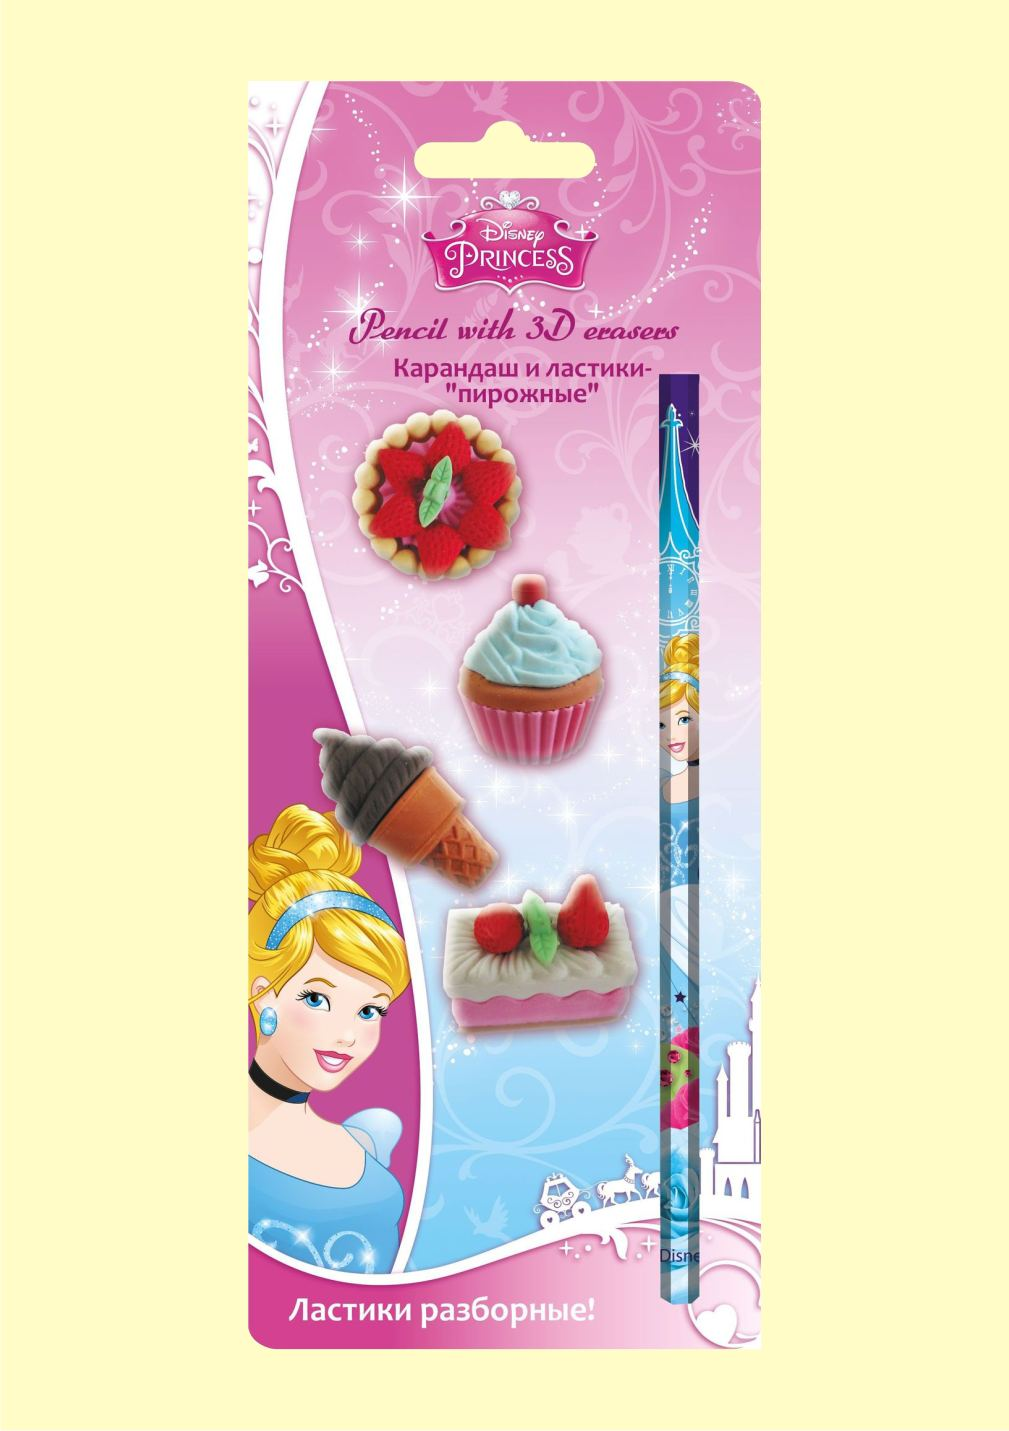 Набор канцелярский Принцессы карандаш, 4 ластика